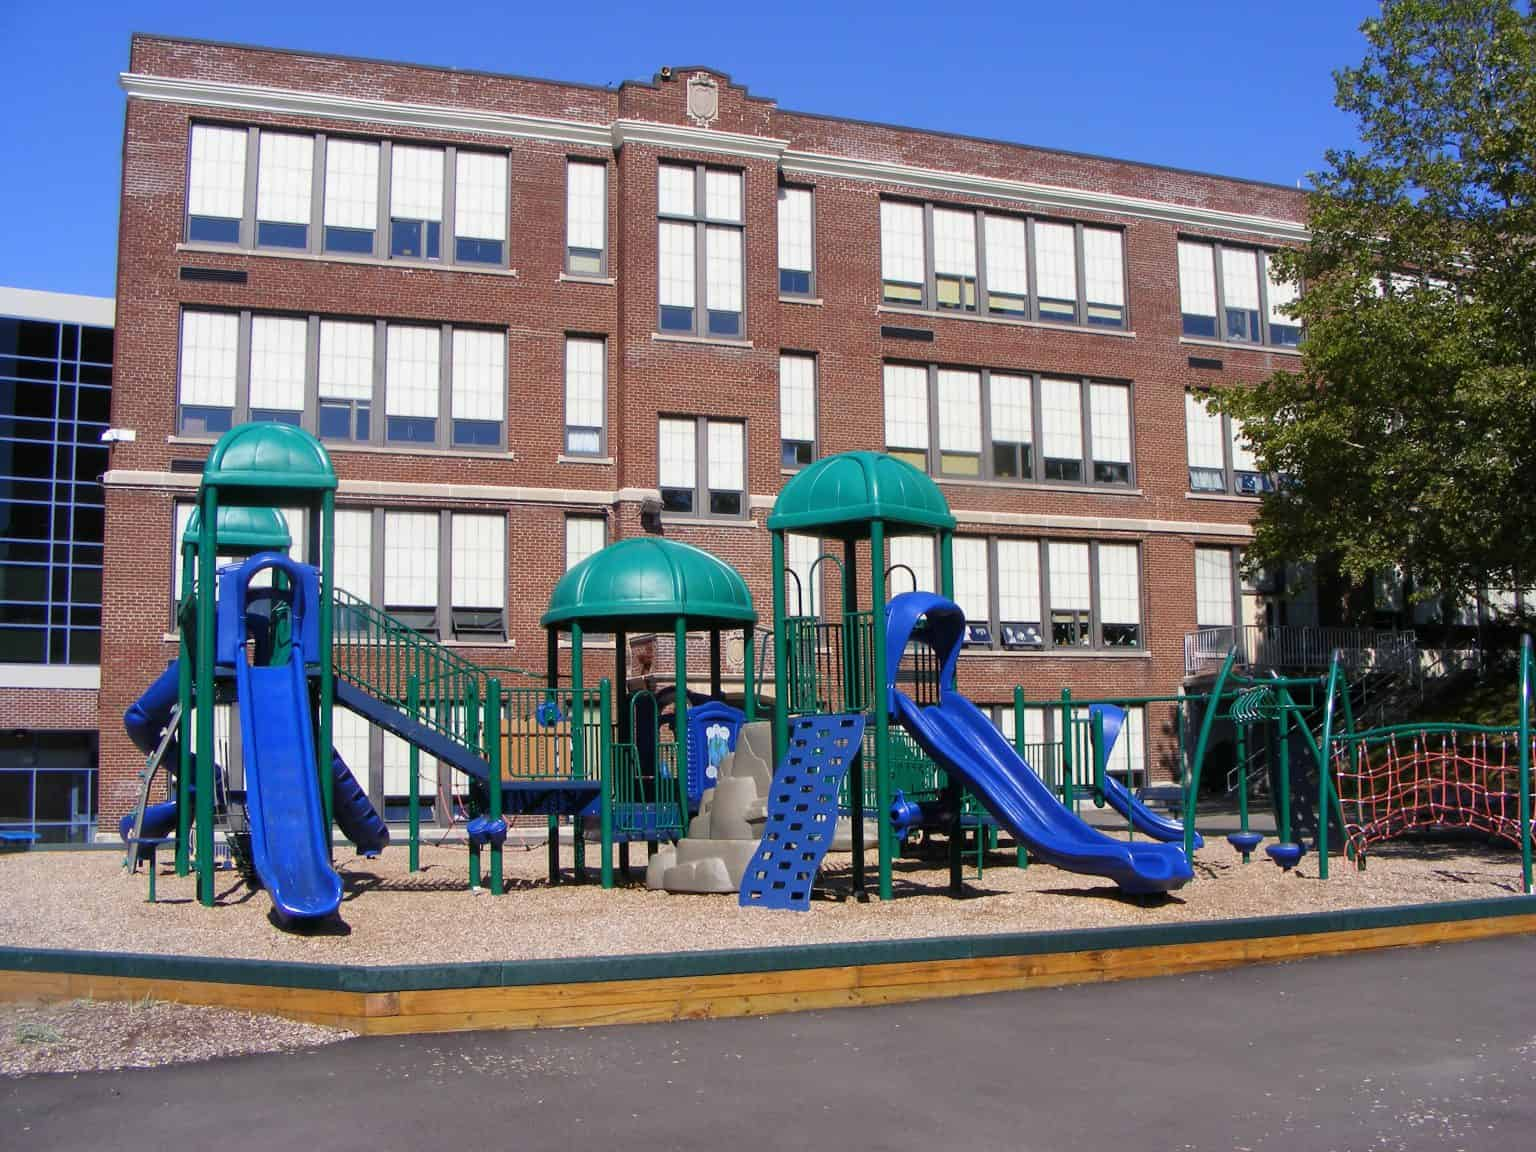 woodrow-wilson-elementary-playground-binghamton-ny_11711836435_o-1536x1152